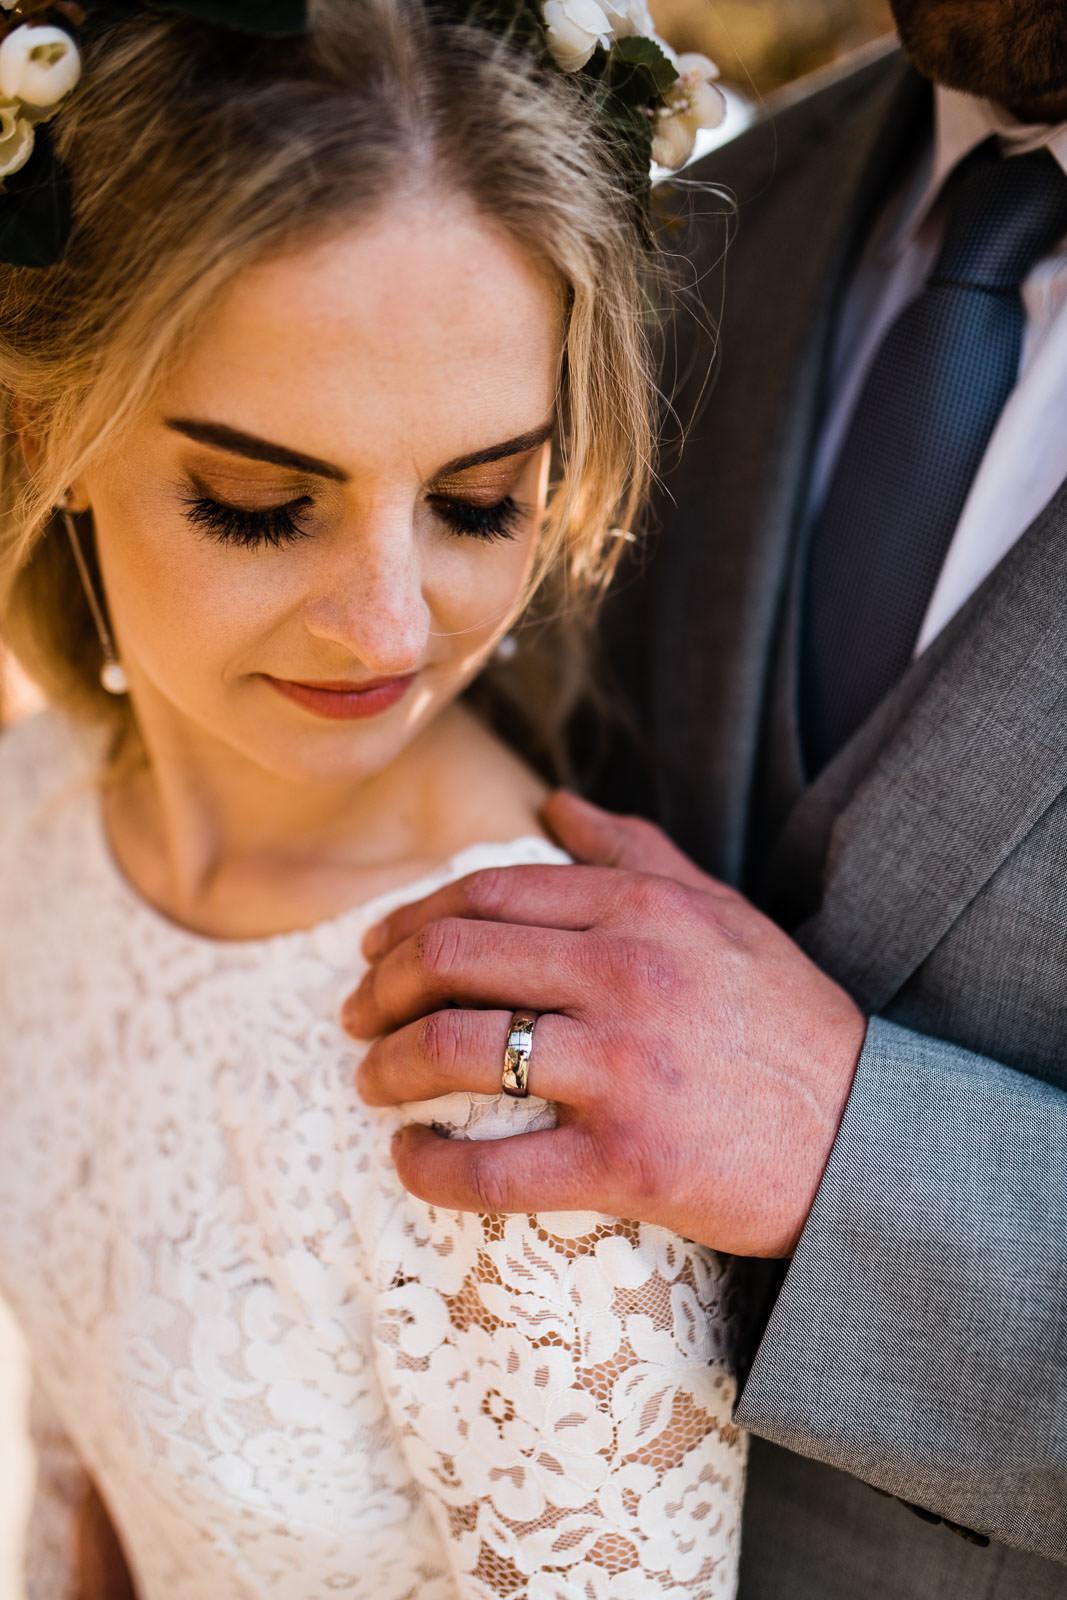 wedding ring on grooms hand and wedding dress